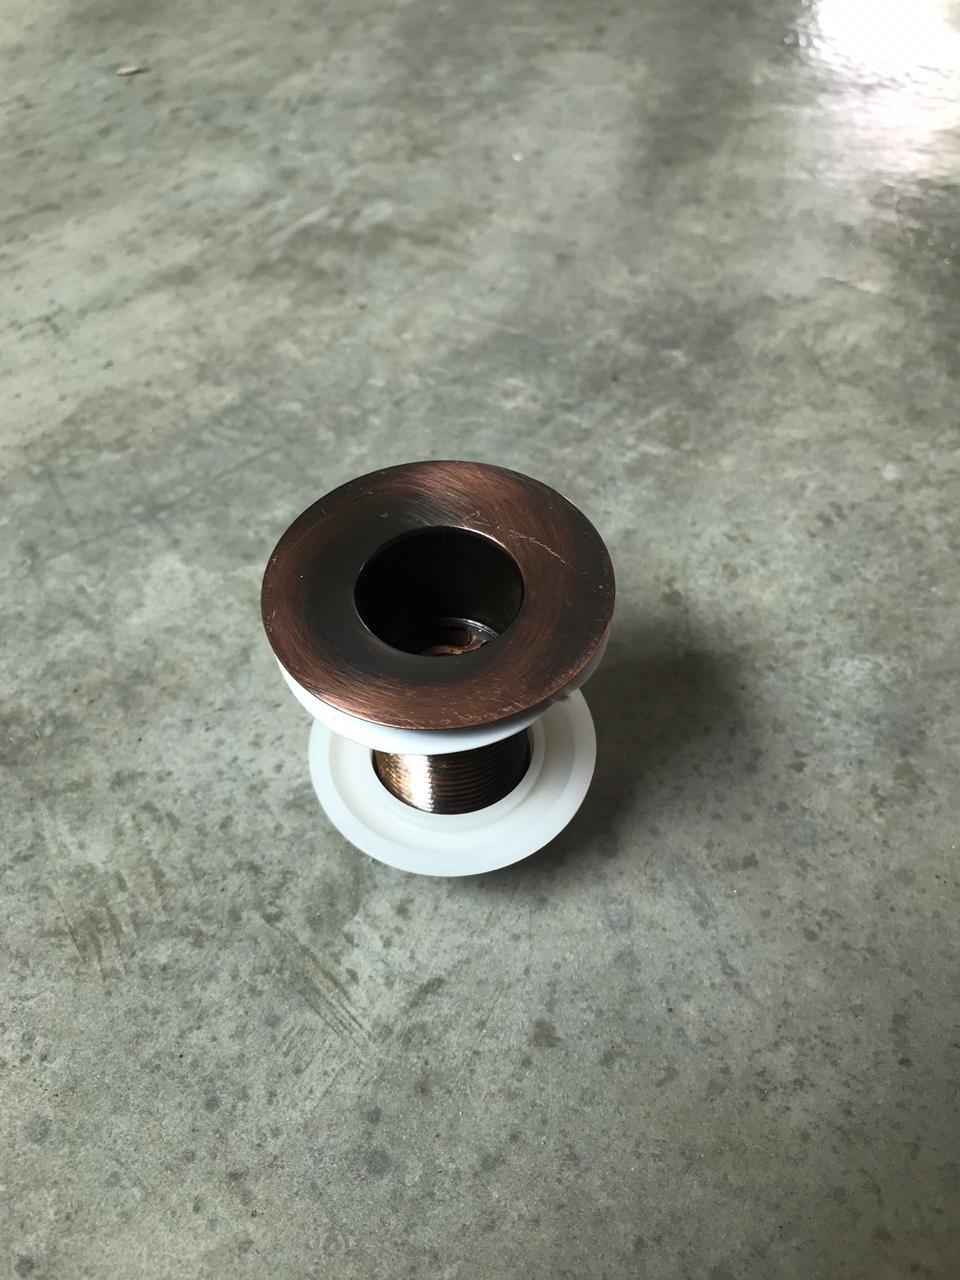 Foto2 - Válvula para cuba em liga de cobre